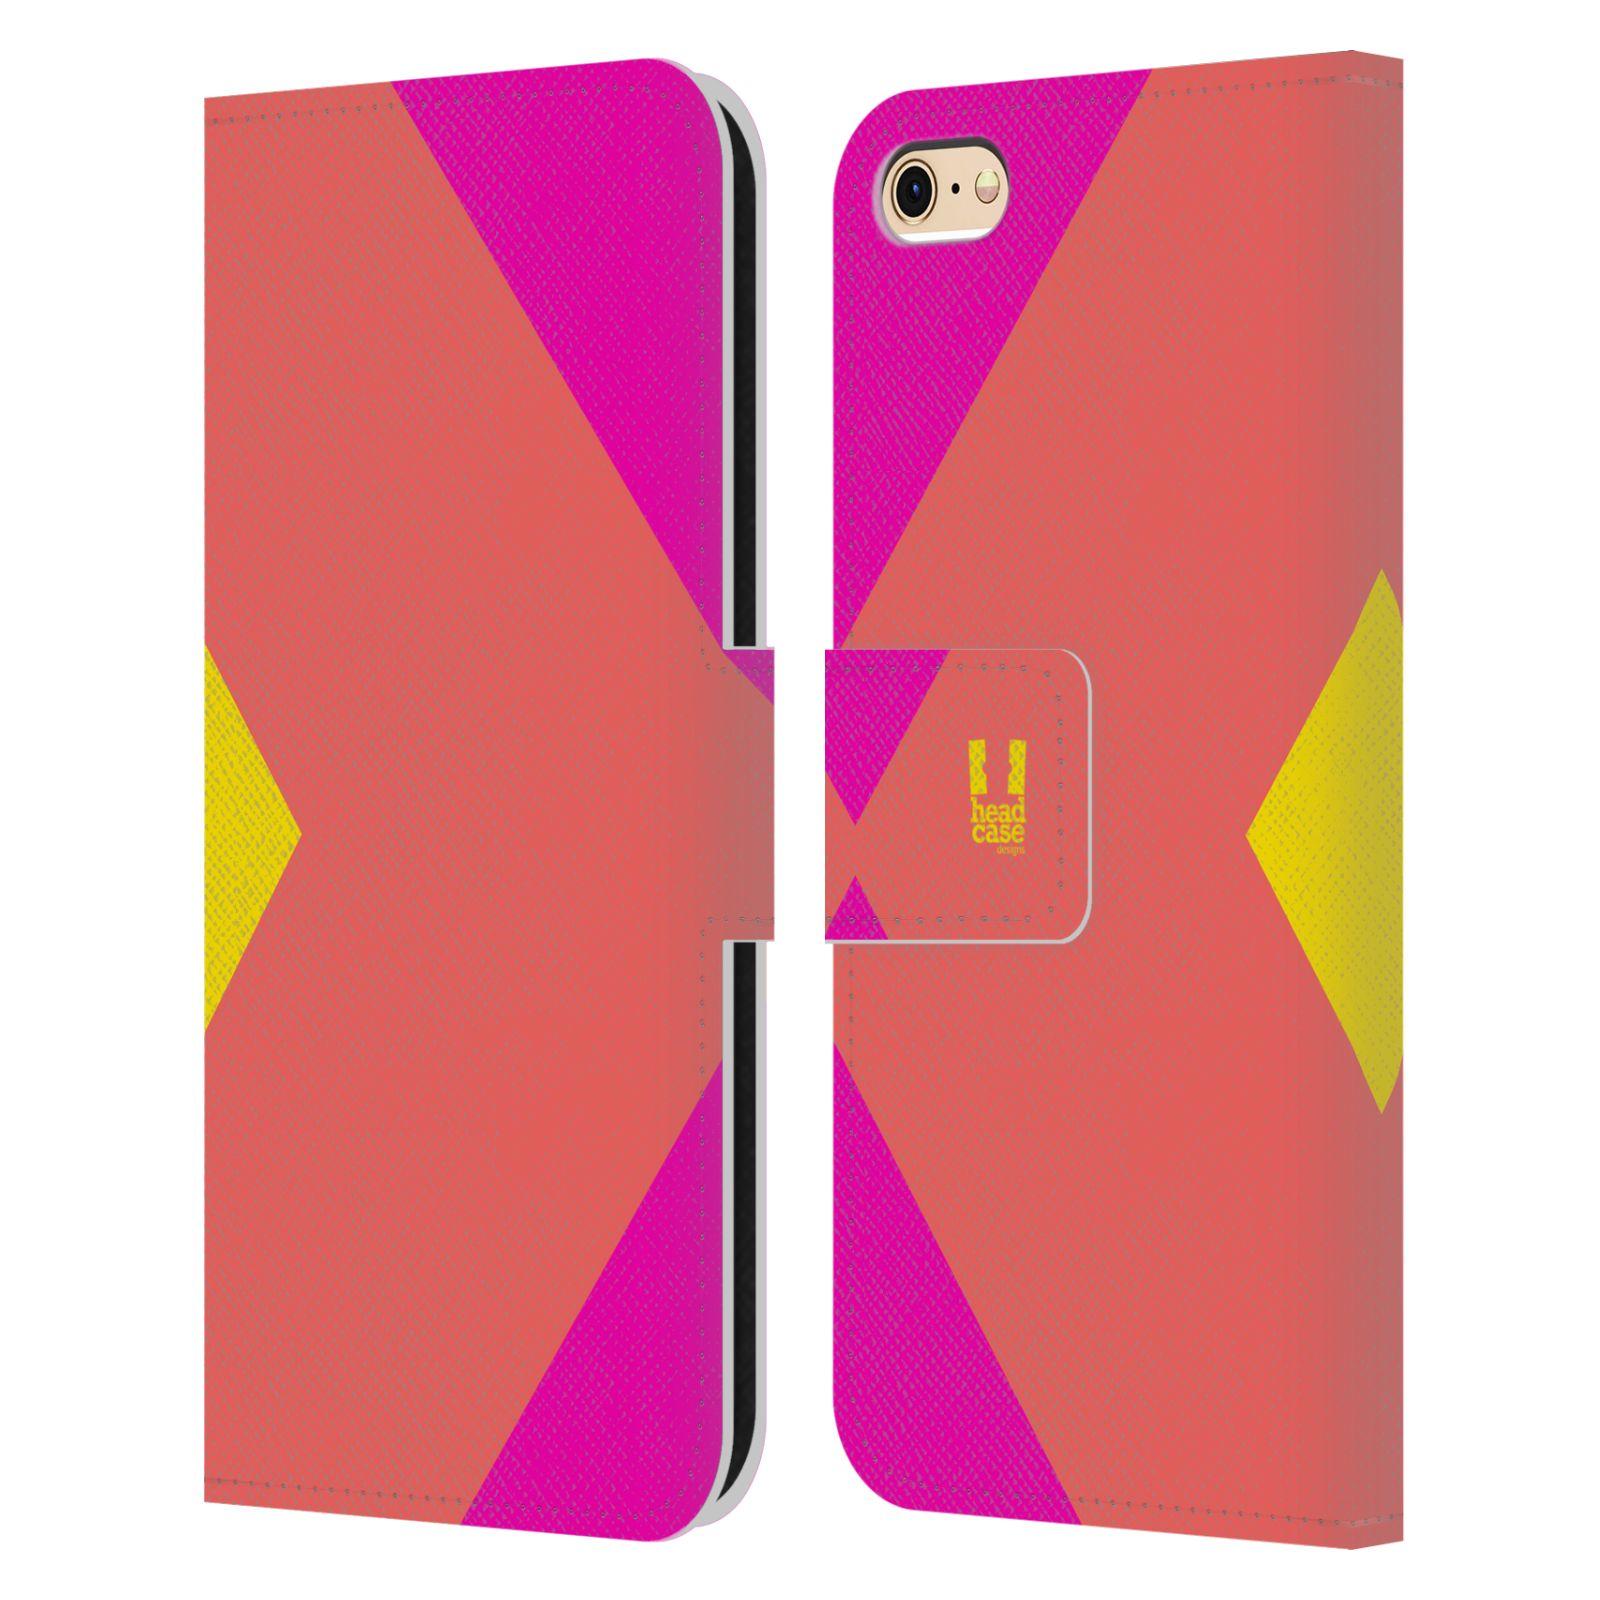 HEAD CASE Flipové pouzdro pro mobil Apple Iphone 6/6s barevné tvary růžová korál